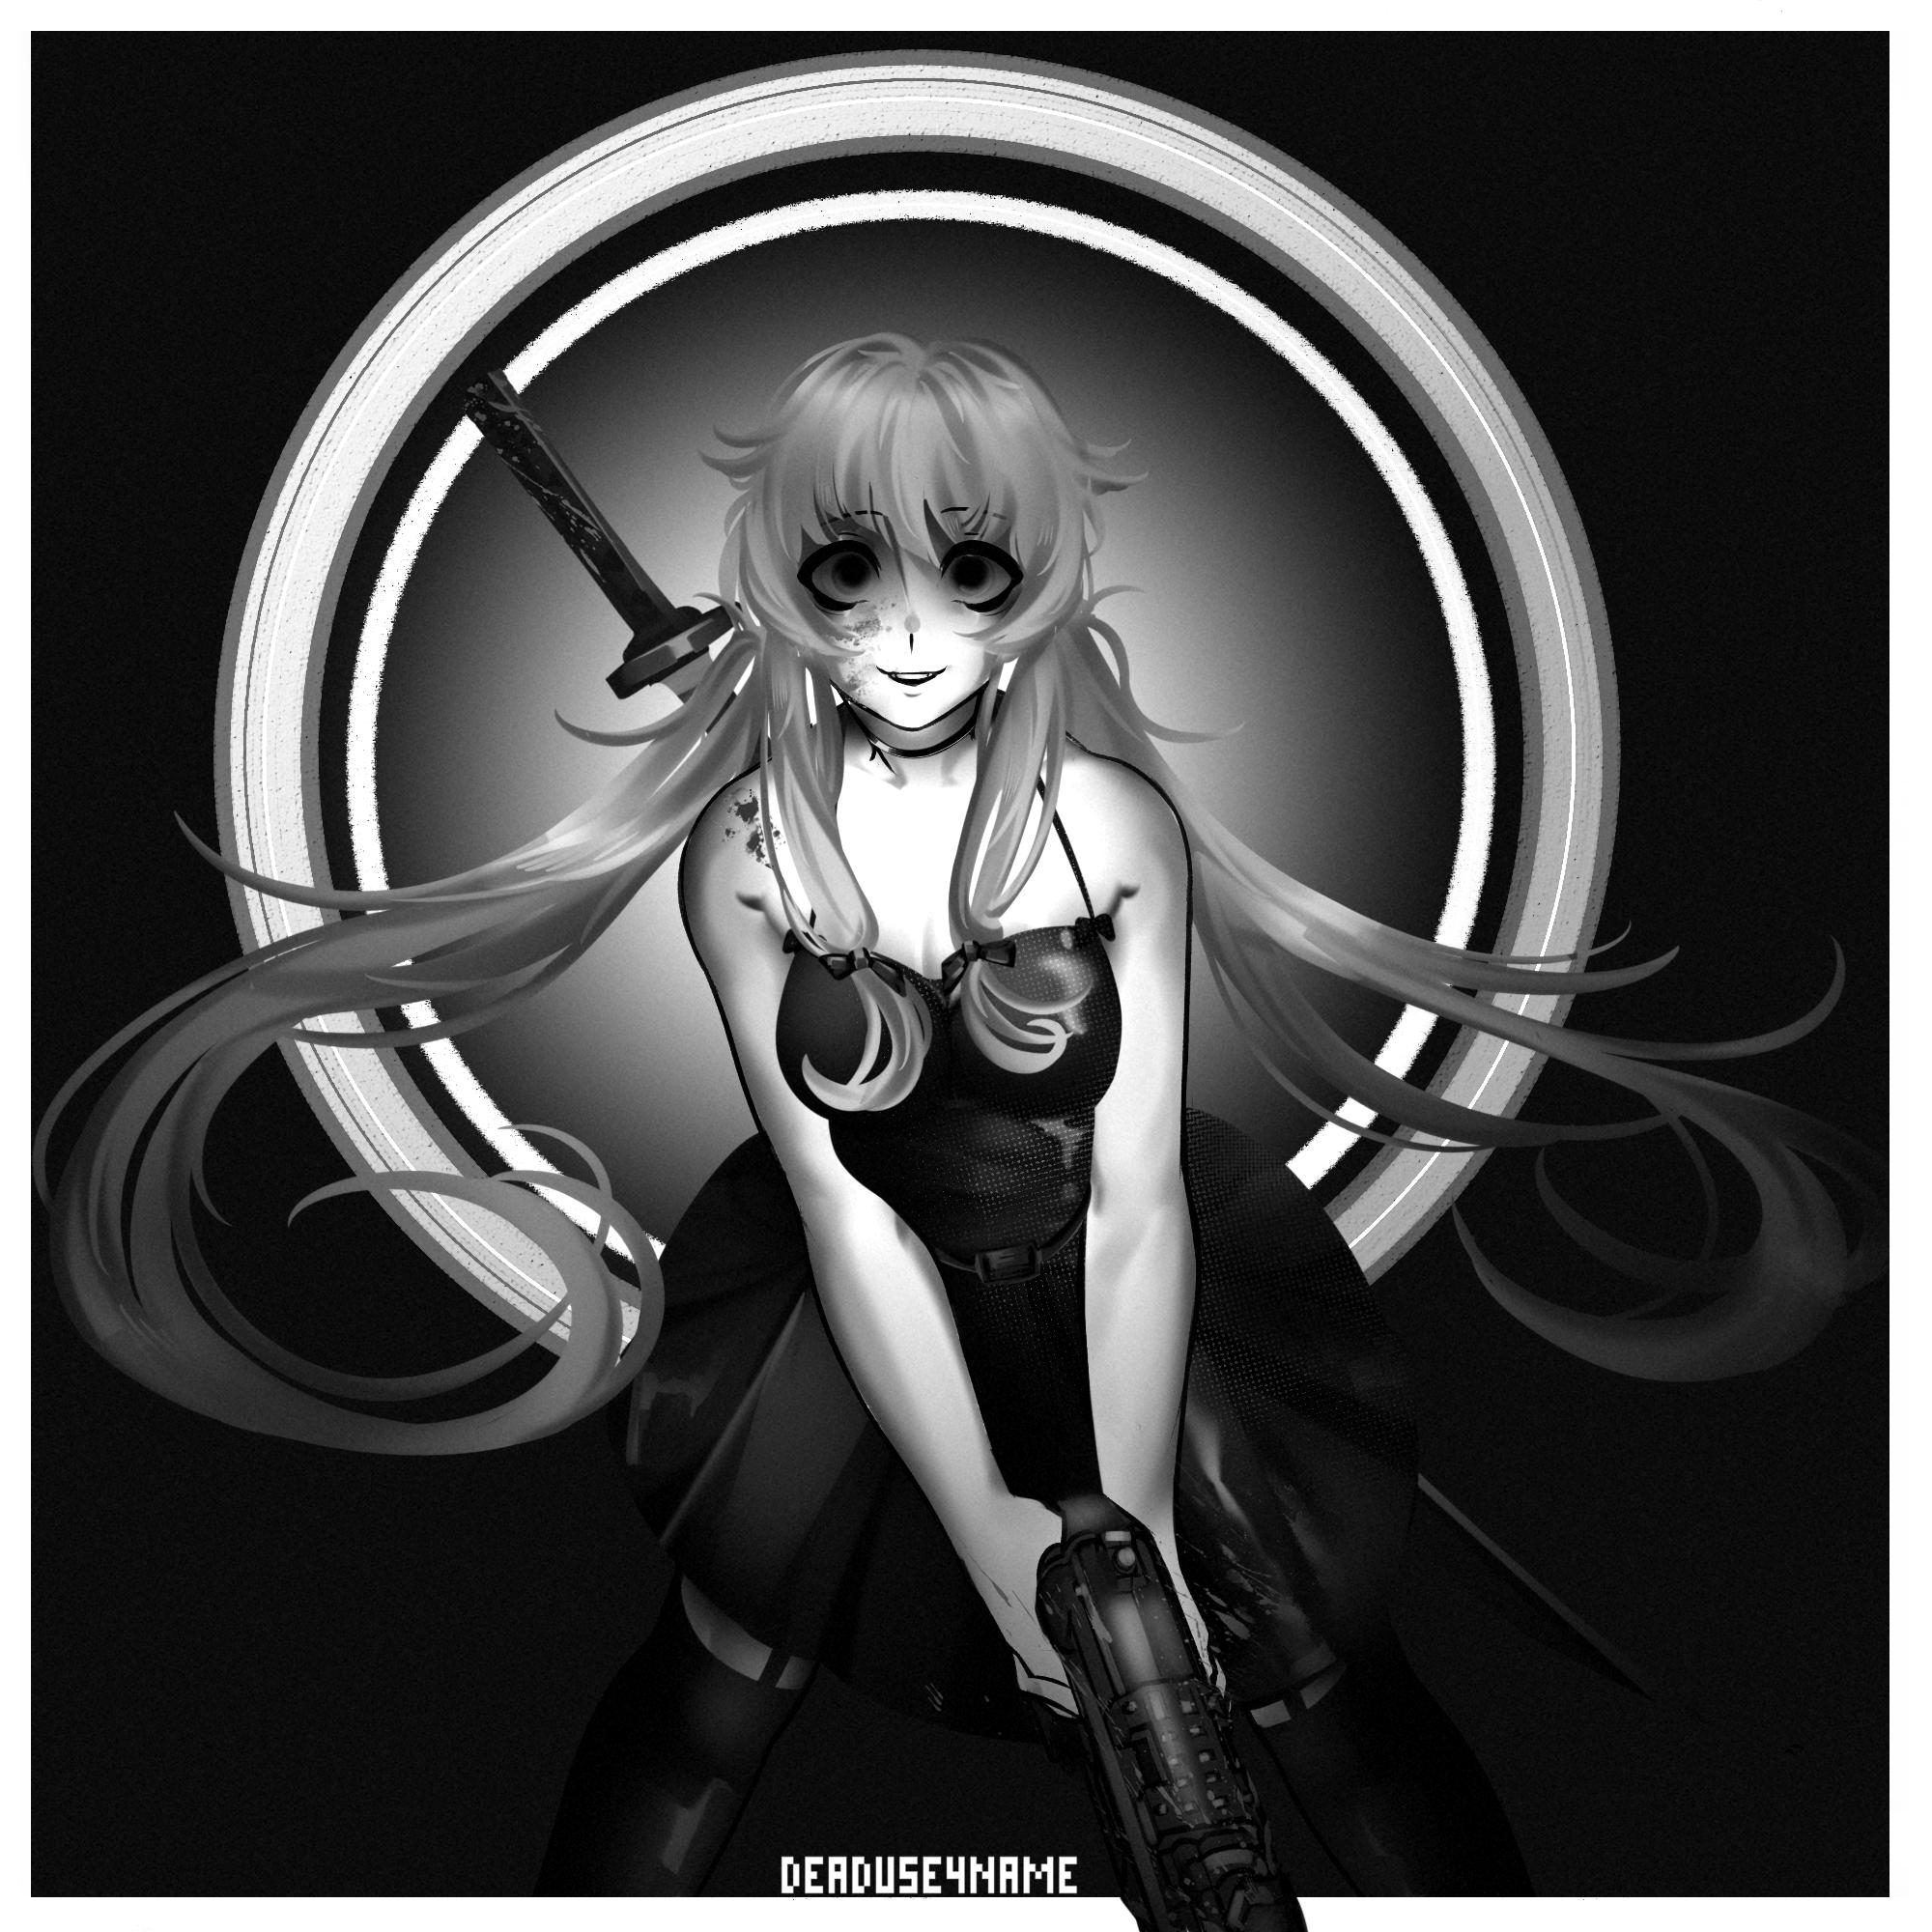 Pin Na Doske Black And White Anime [ 2000 x 2000 Pixel ]